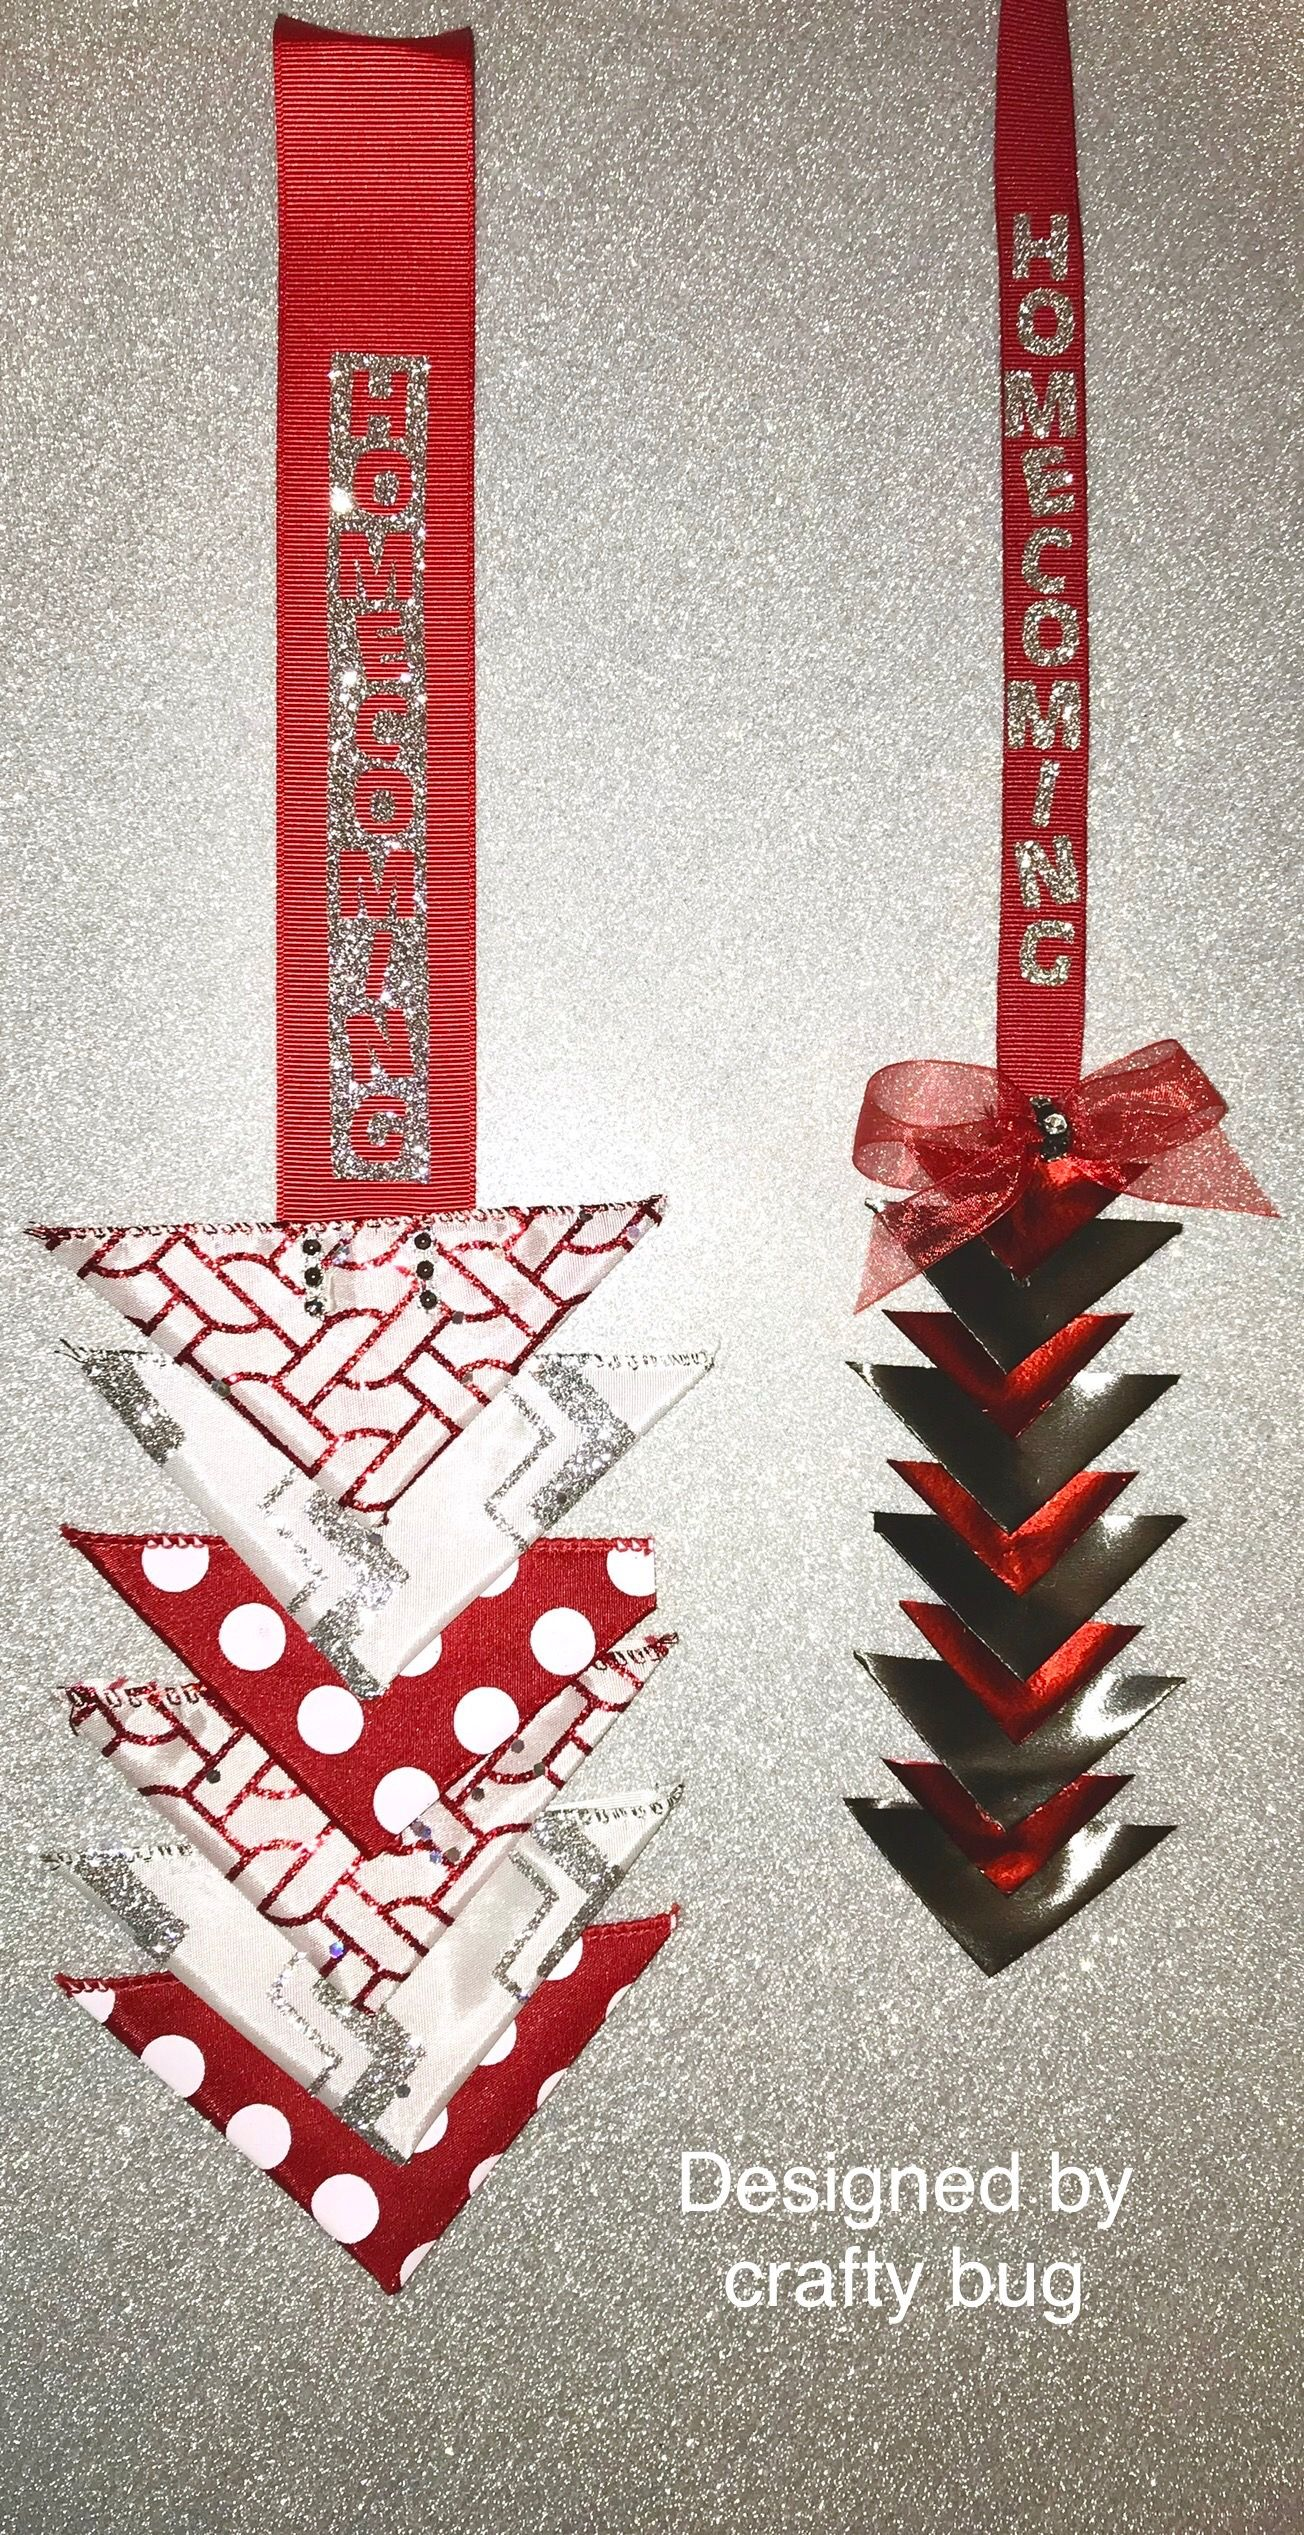 Red, white, & silver triangular homecoming mum chain  Silver glitter